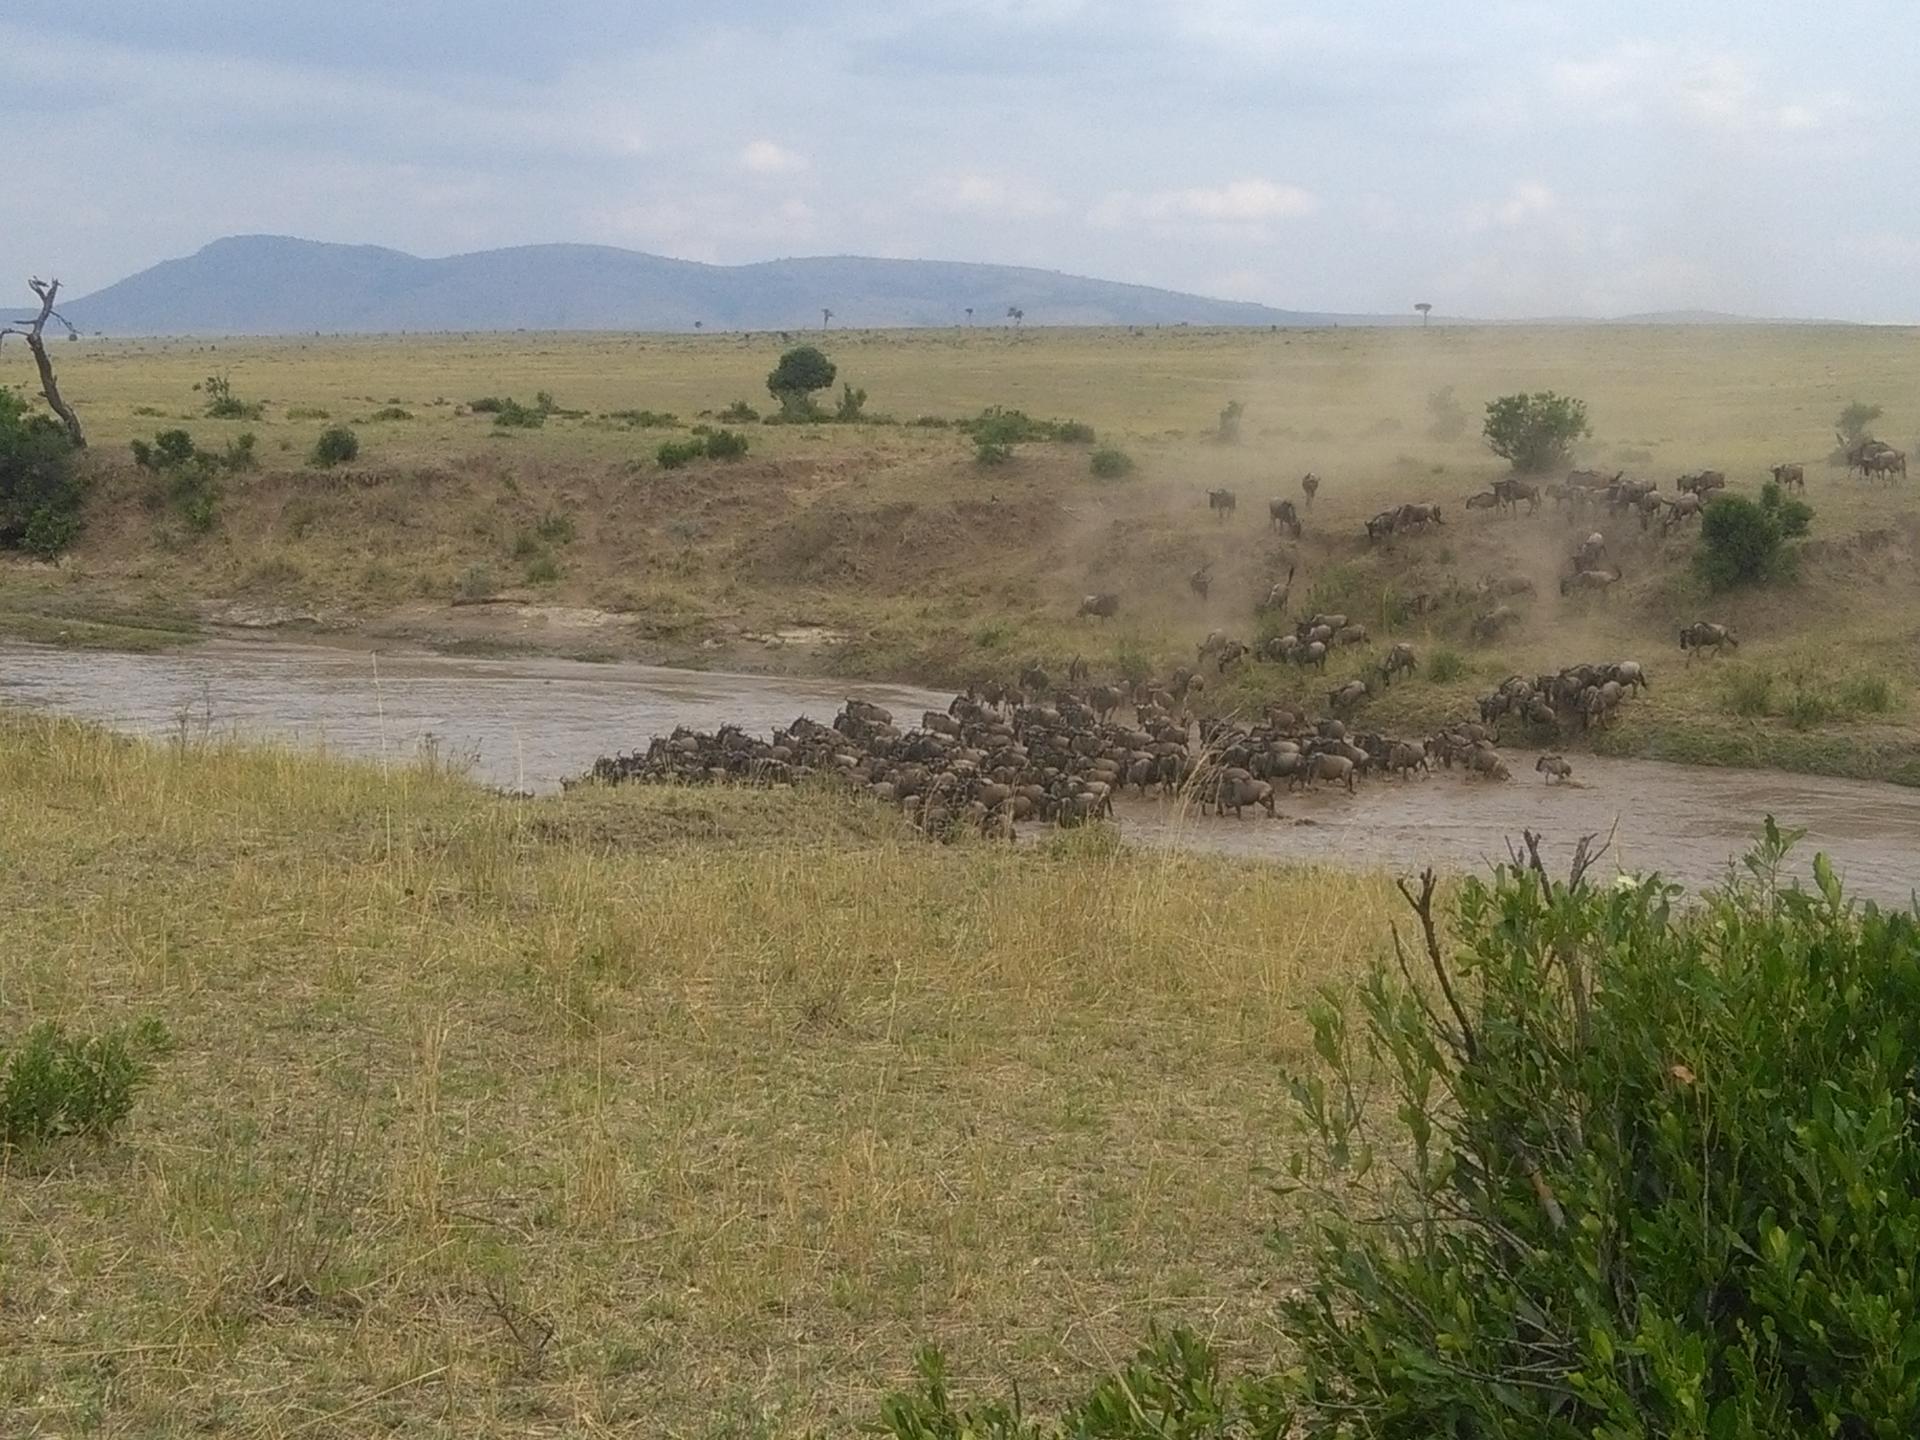 Kenya Adventure Safaris, Active Adventures, YHA Kenya Travel Tours And Safaris, Wildlife Safari